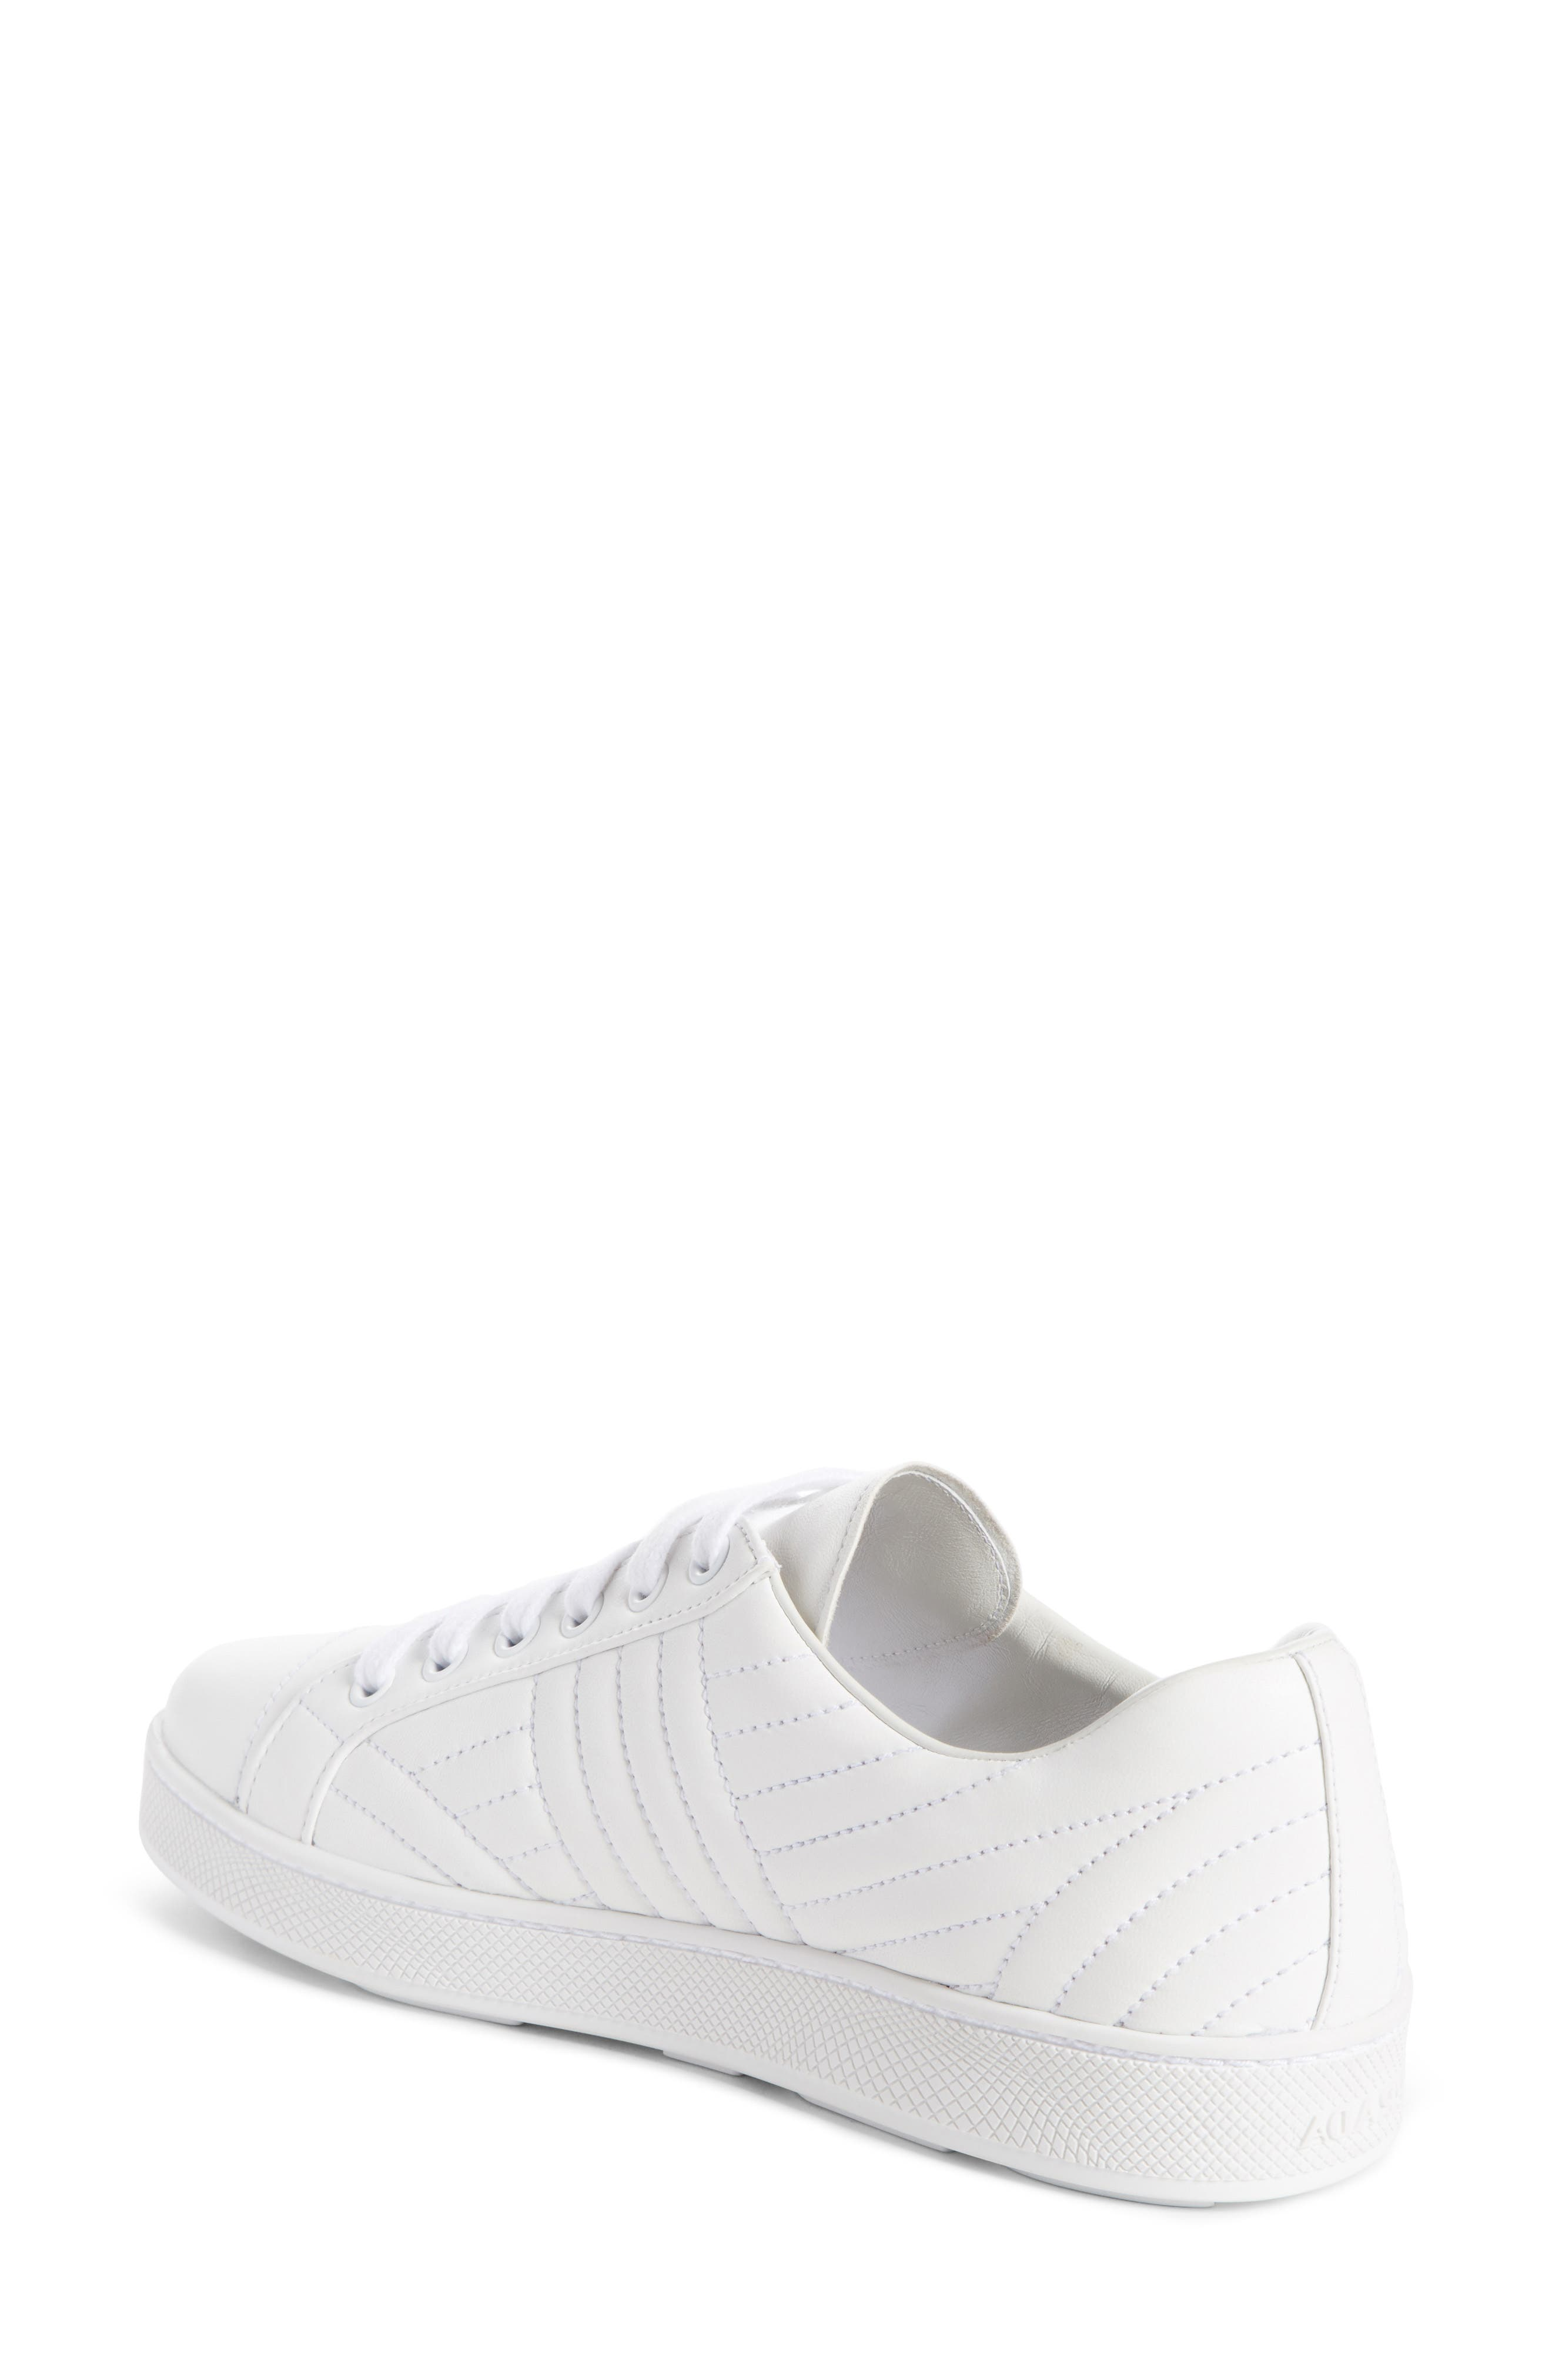 9e8ee66cf97 Prada Women s Shoes